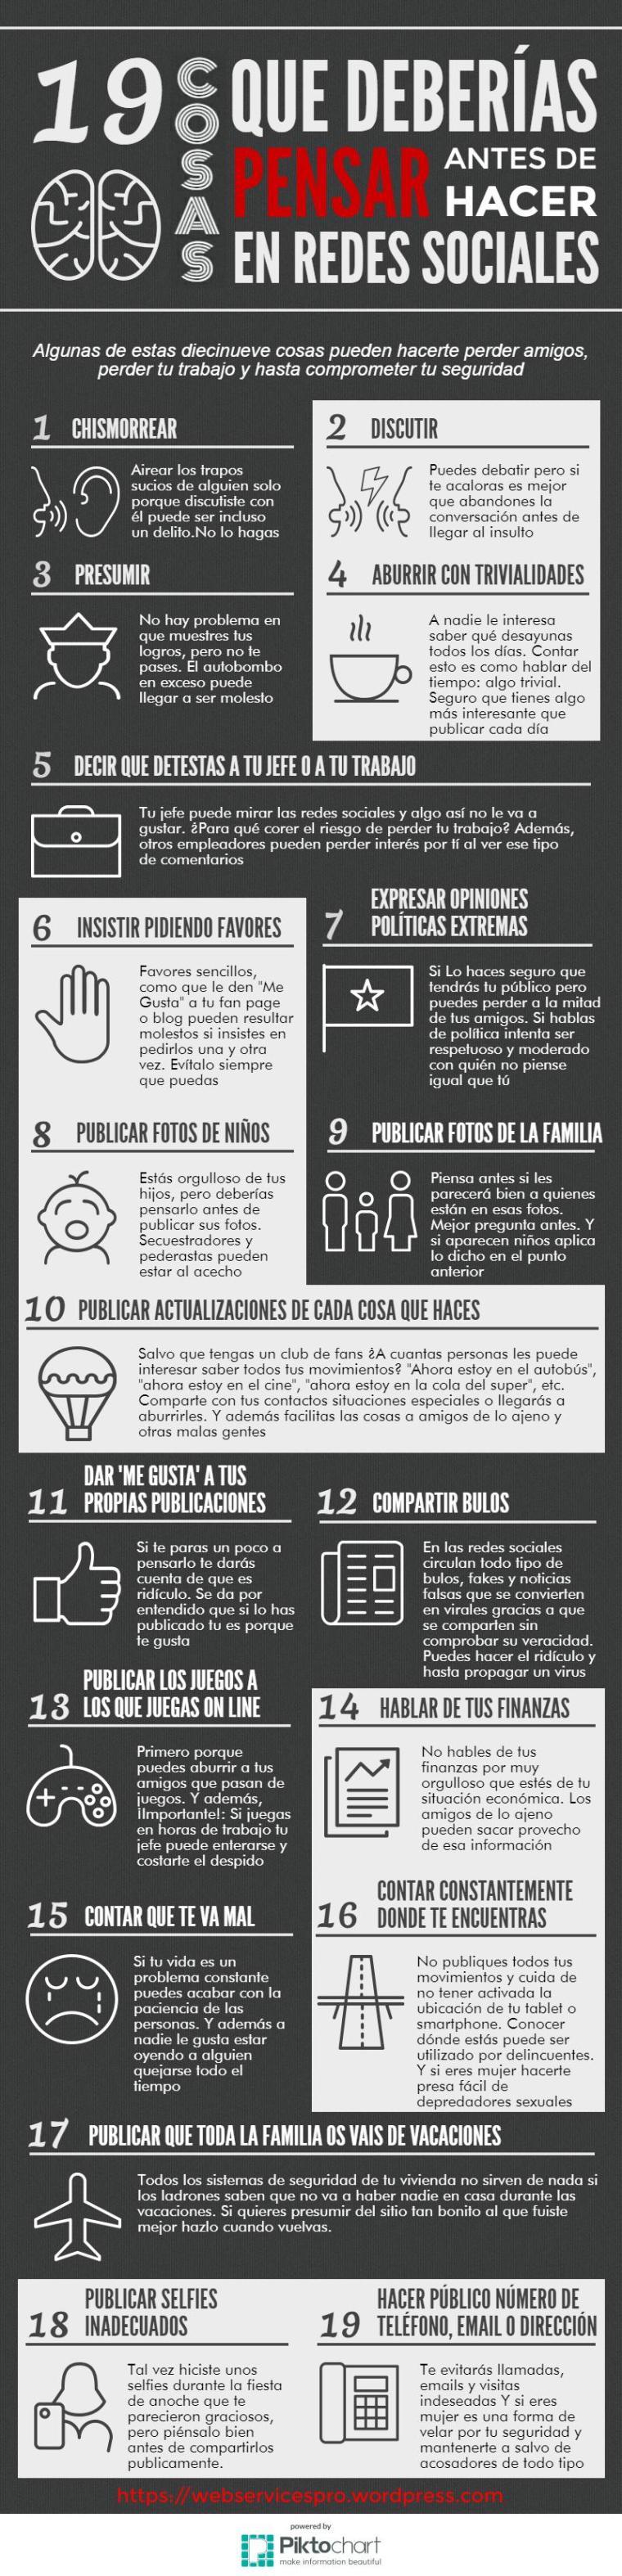 19-cosas-que-debes-pensar-antes-de-publicar-en-las-redes-sociales-infografia.jpeg